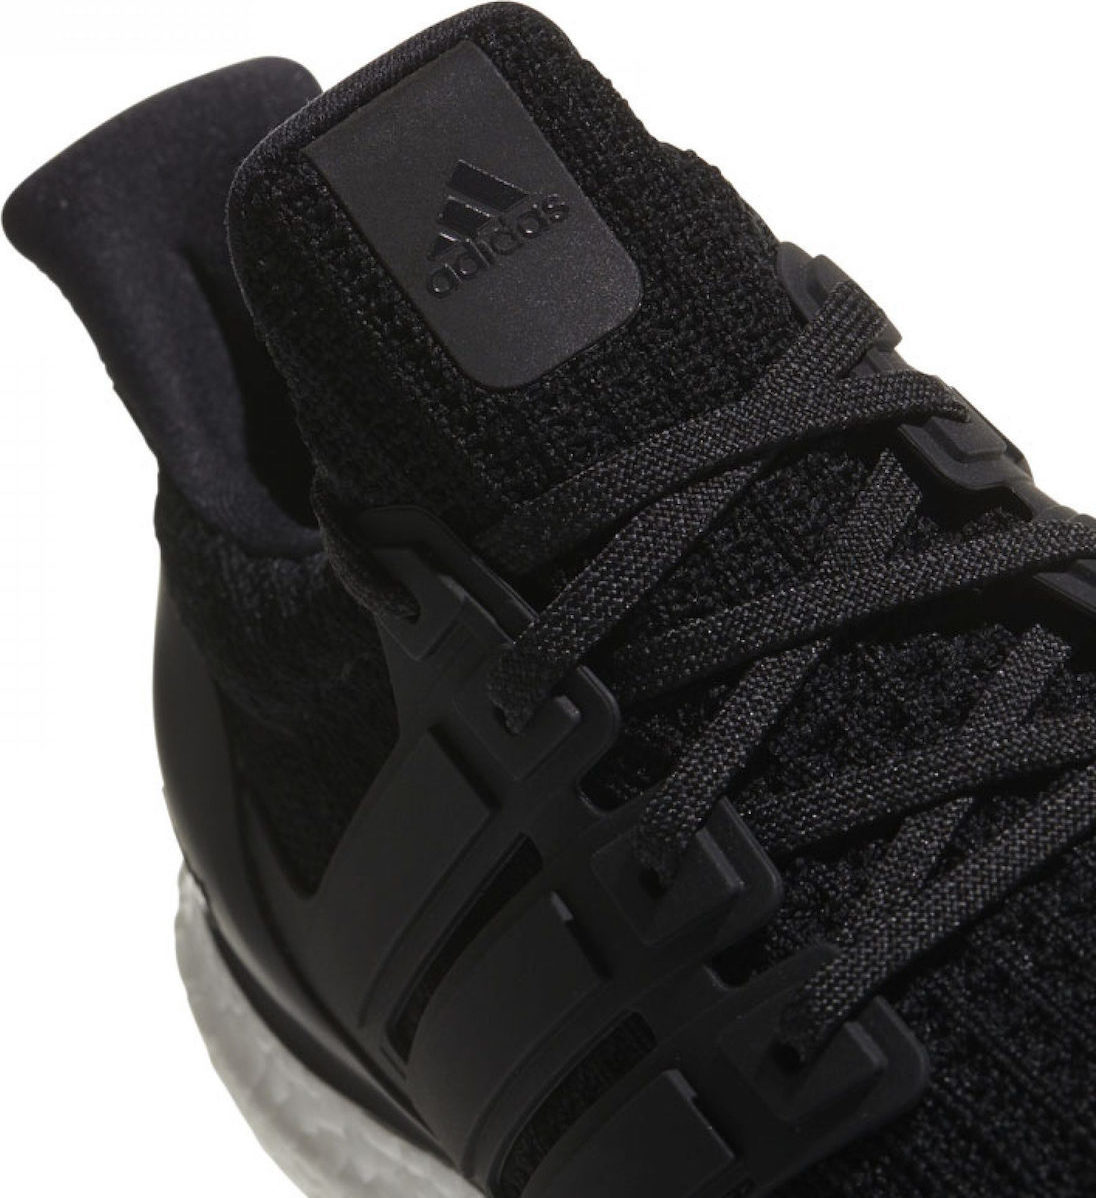 Adidas Ultraboost BB6166